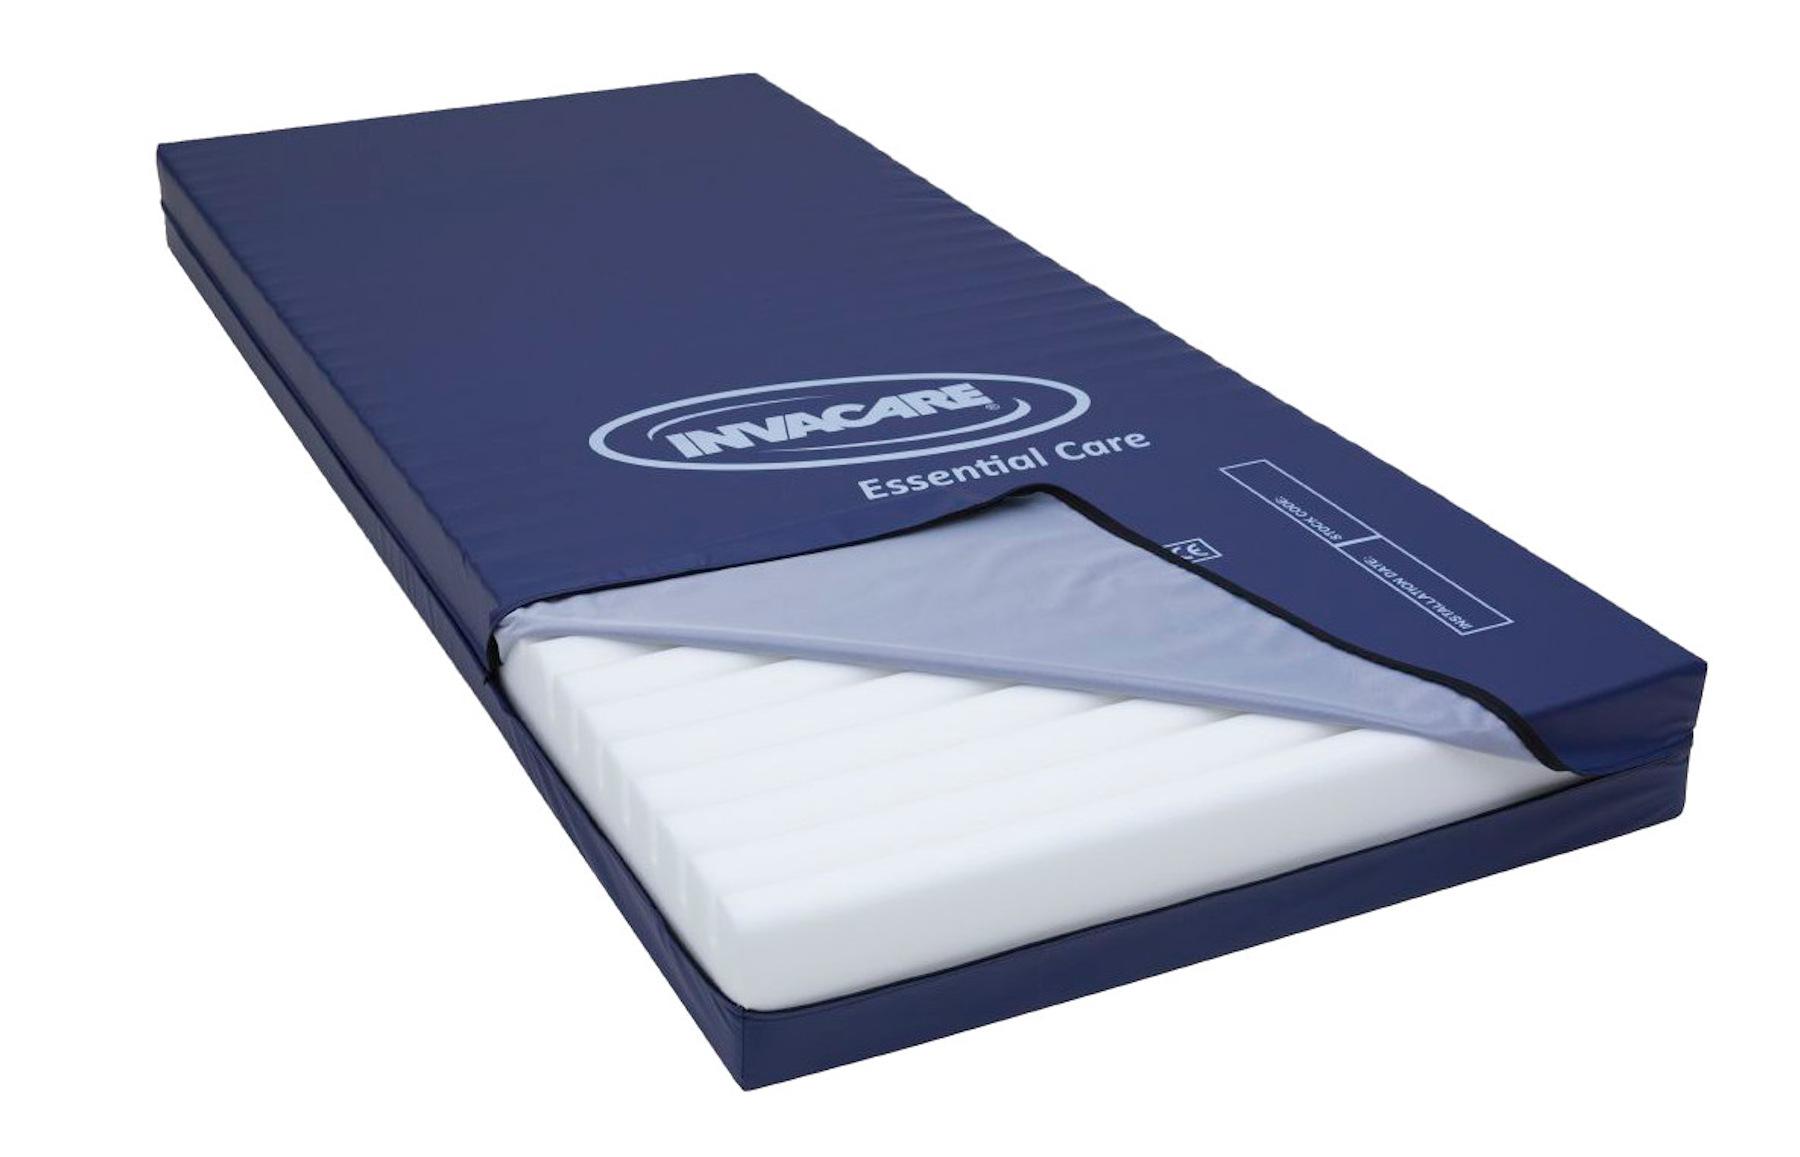 essential-care-materasso-invacare-antidecubito-pressione